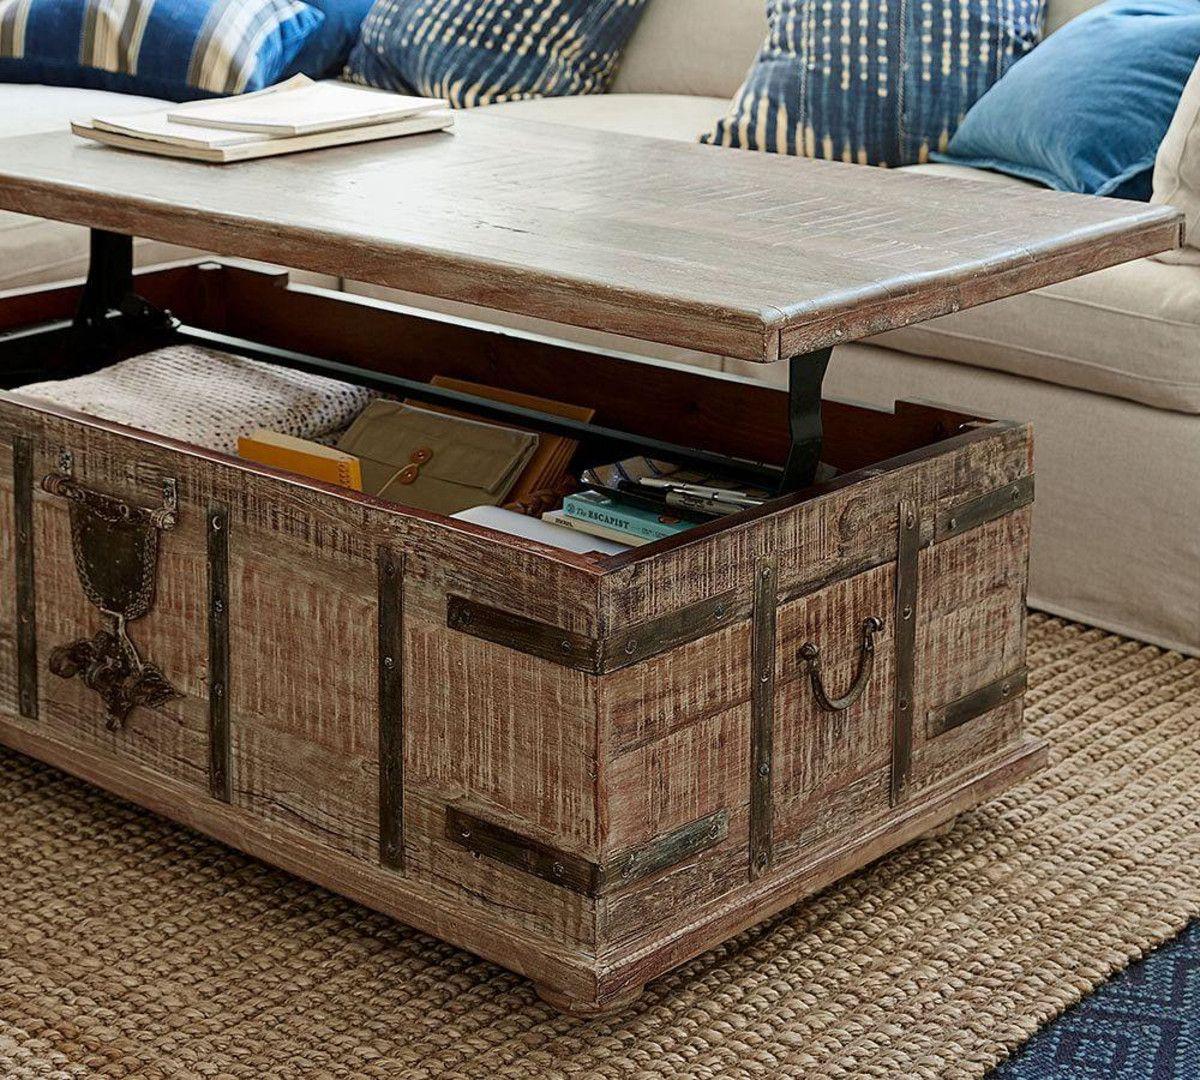 Kaplan Lift Trunk Wood Lift Top Coffee Table Coffee Table Trunk Coffee Table [ 1080 x 1200 Pixel ]